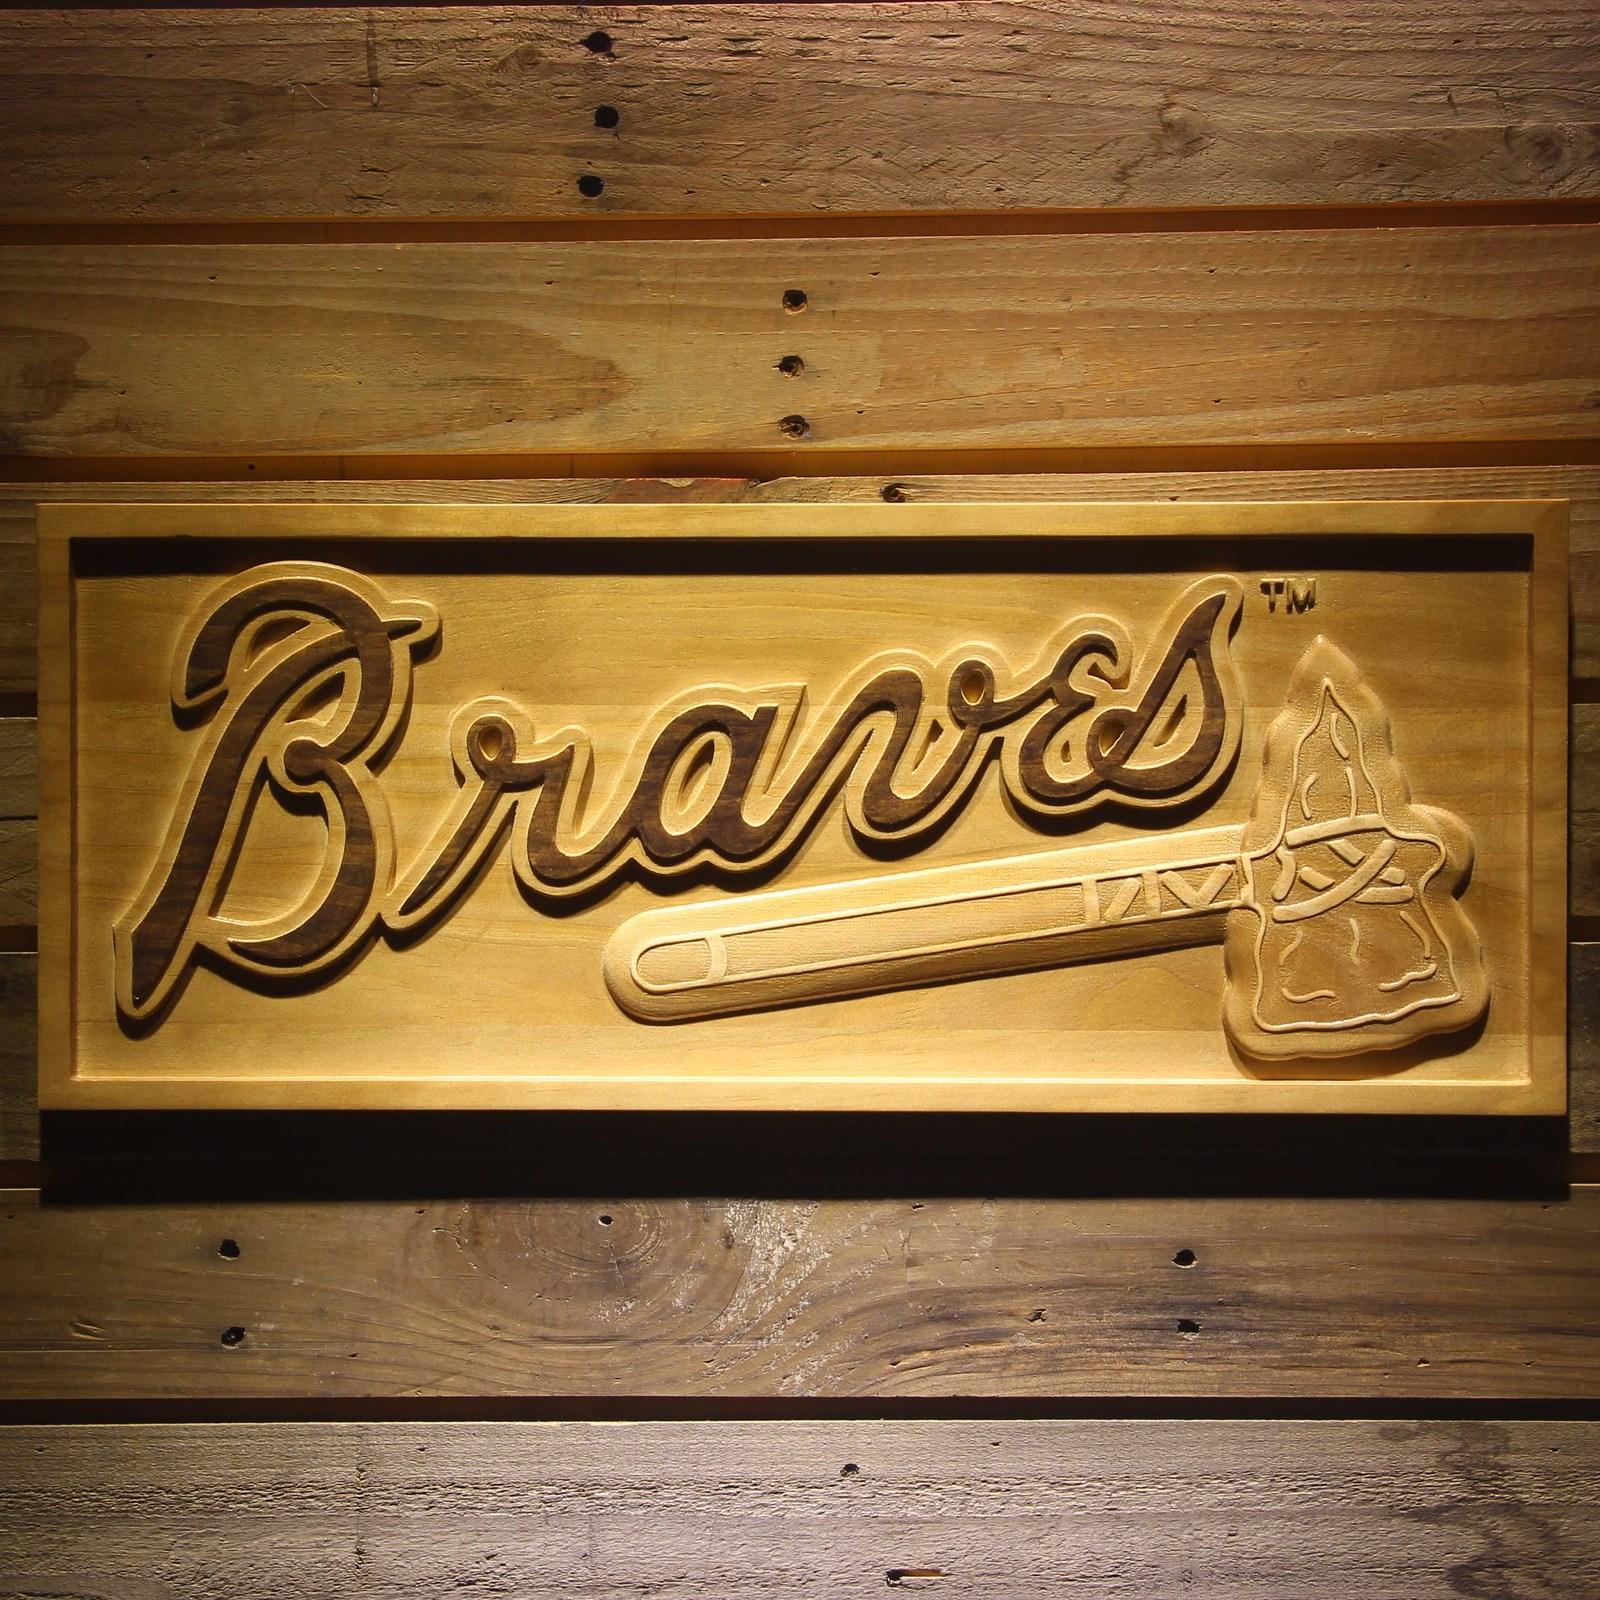 Baseball Home Decor: Atlanta Braves MLB Baseball Team Wooden Sign Wall Art Home